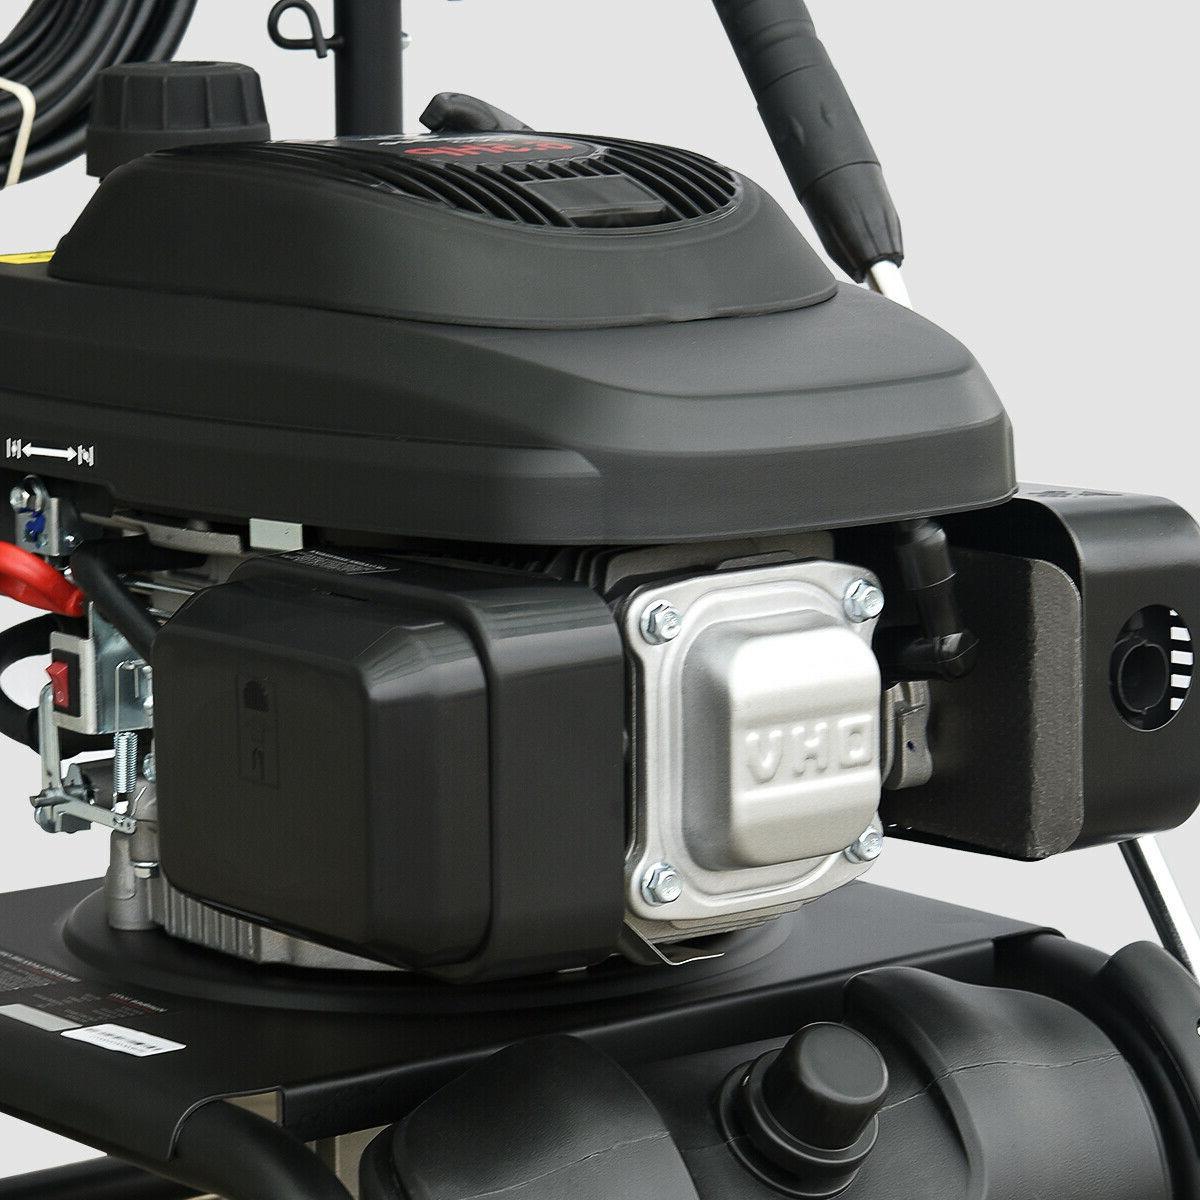 HUMBEE WG-3200 2.6 Washer CARB